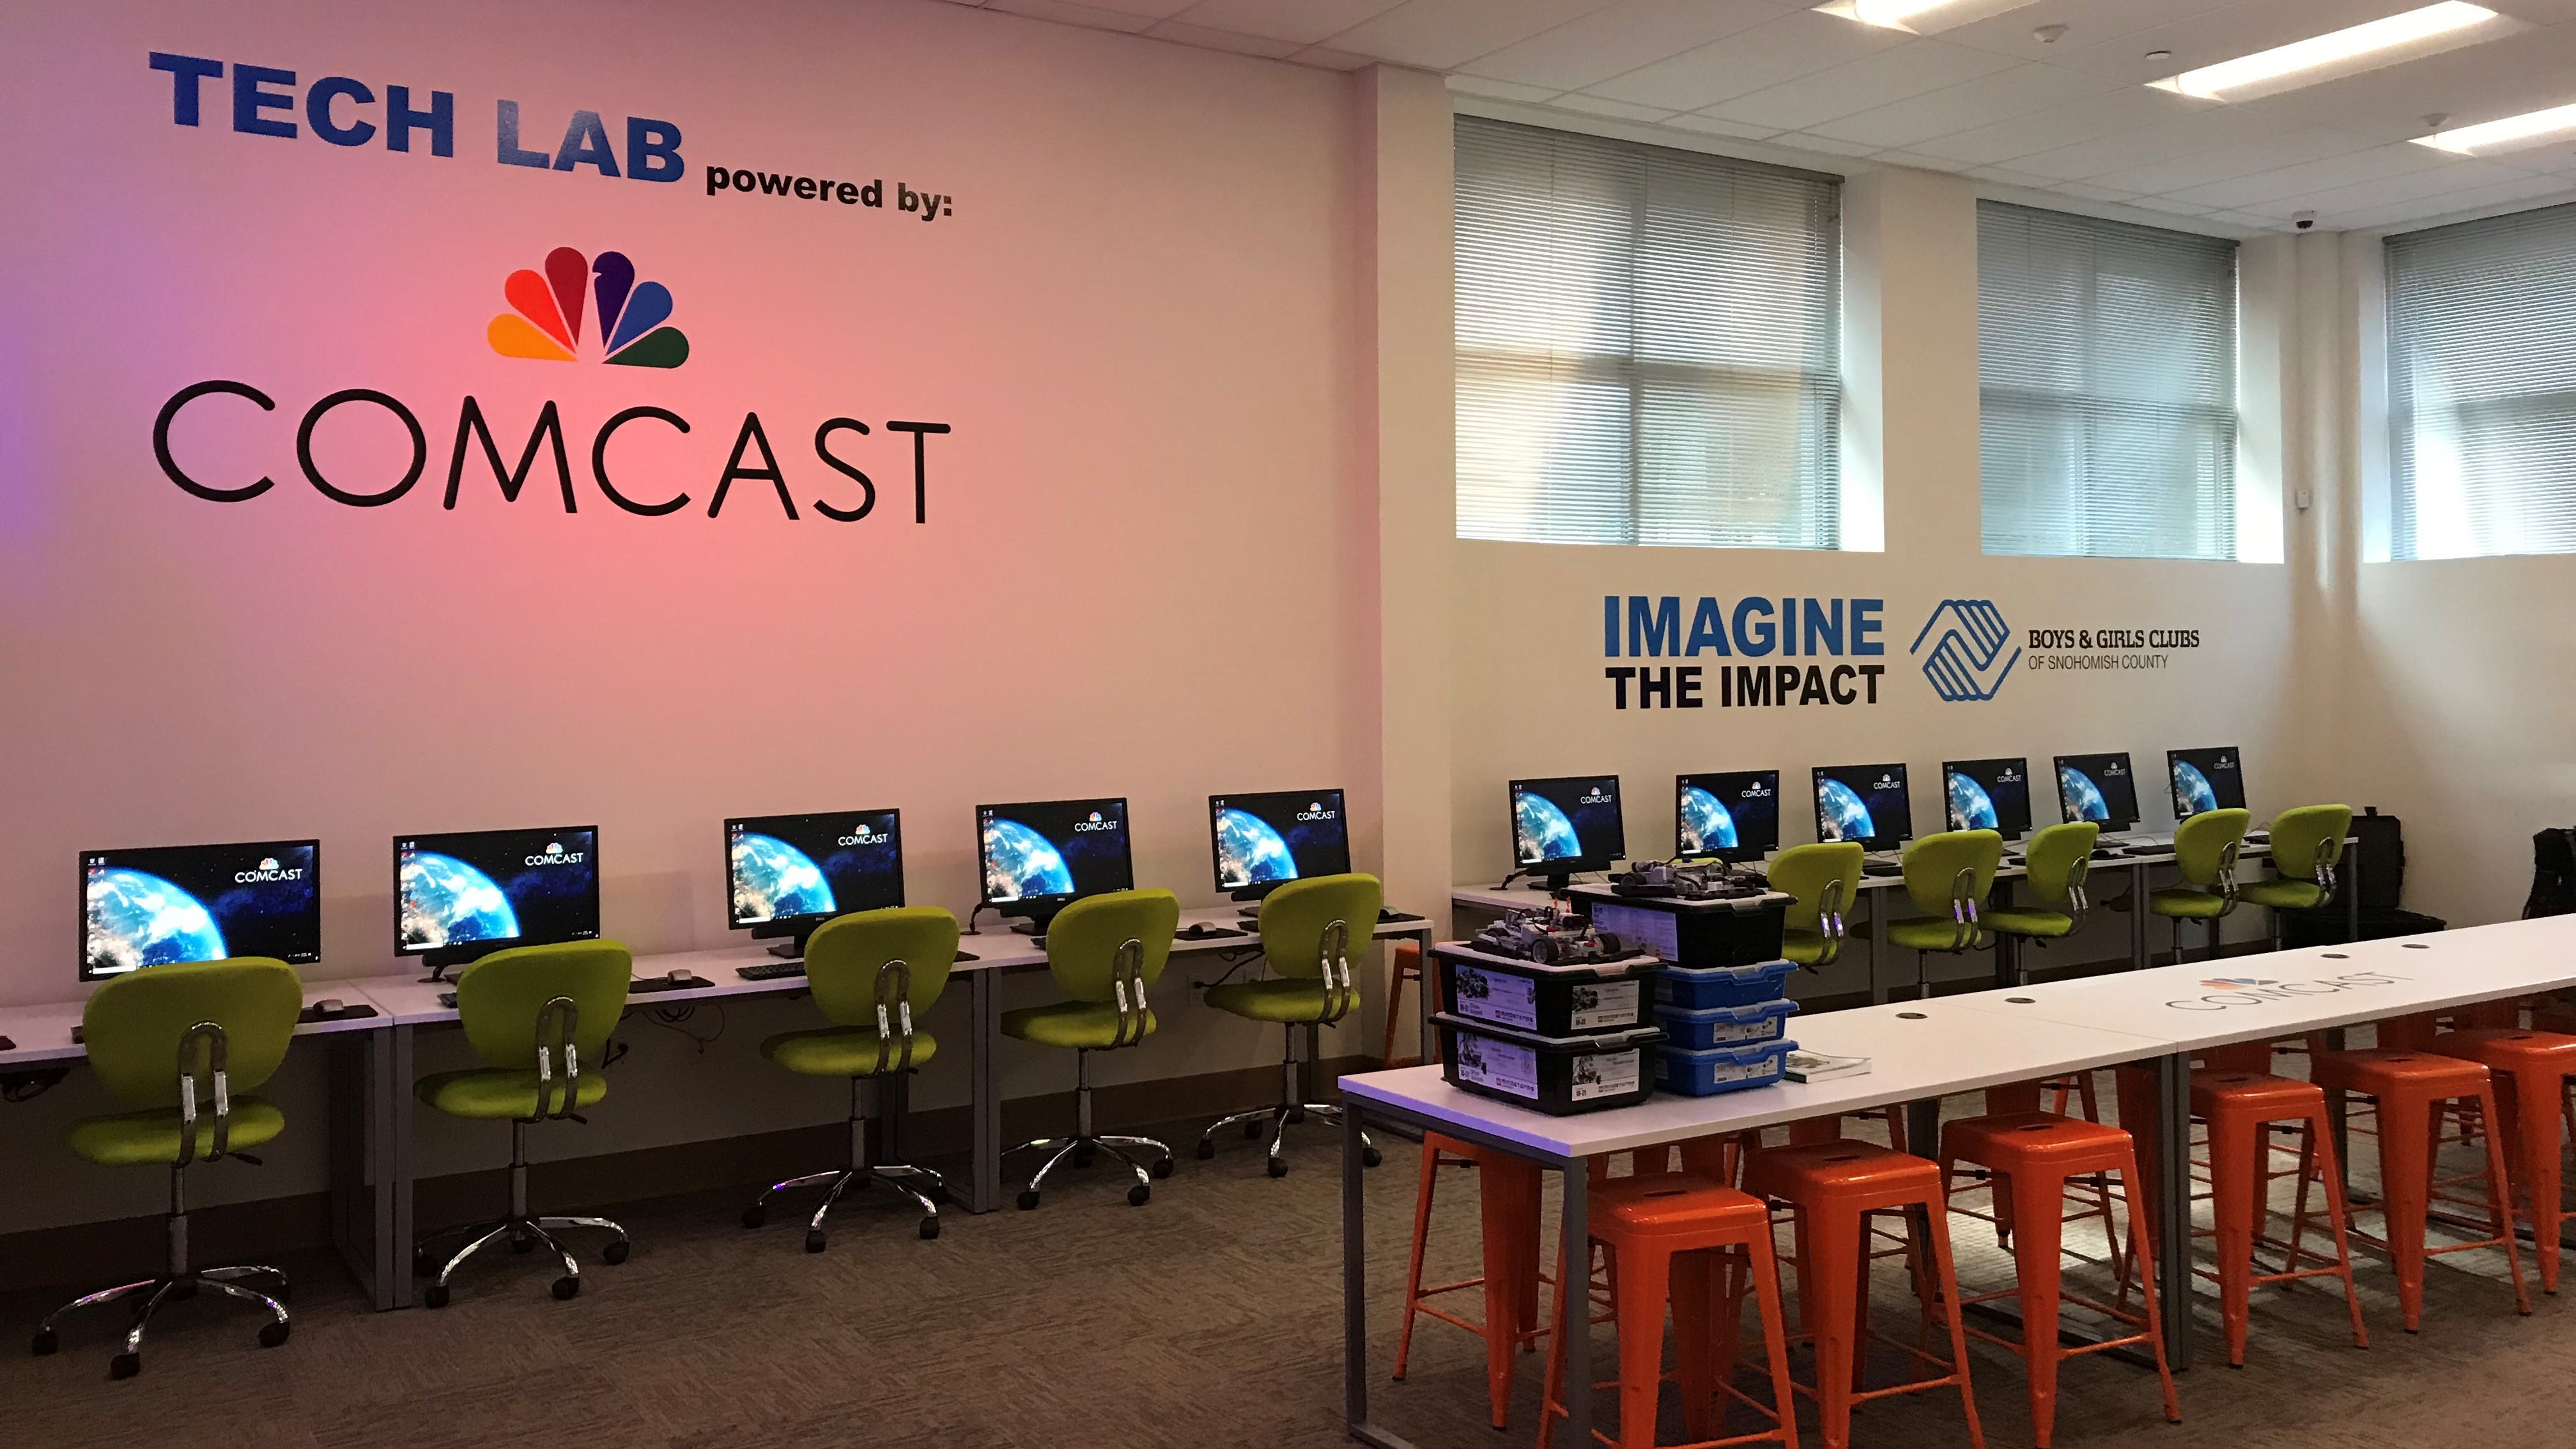 comcast tech lab